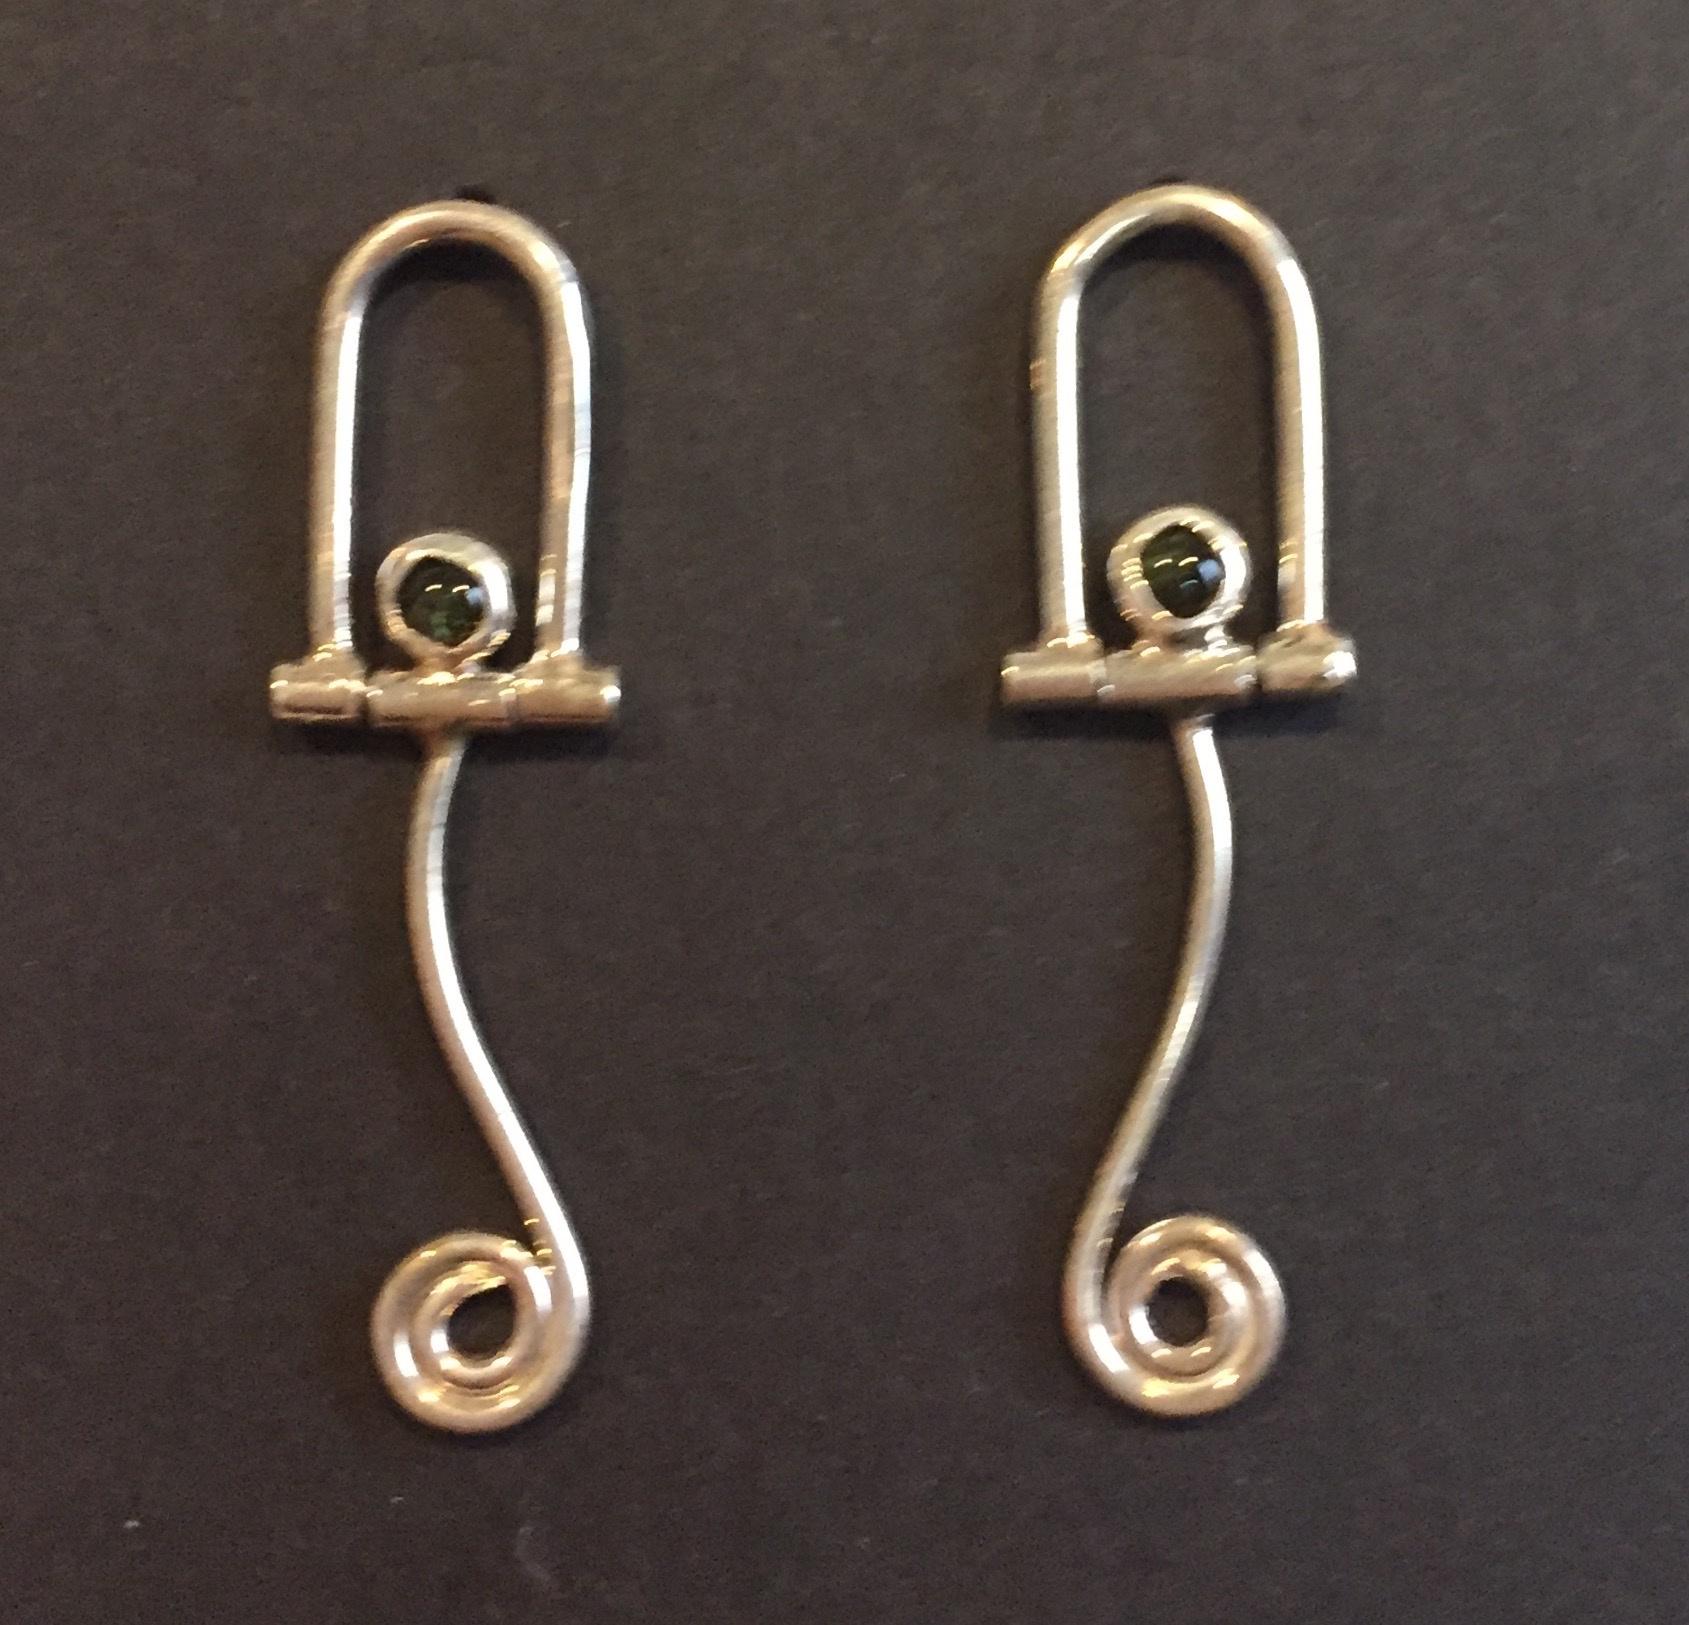 Green Tourmaline Earrings sterling and tourmaline $80.